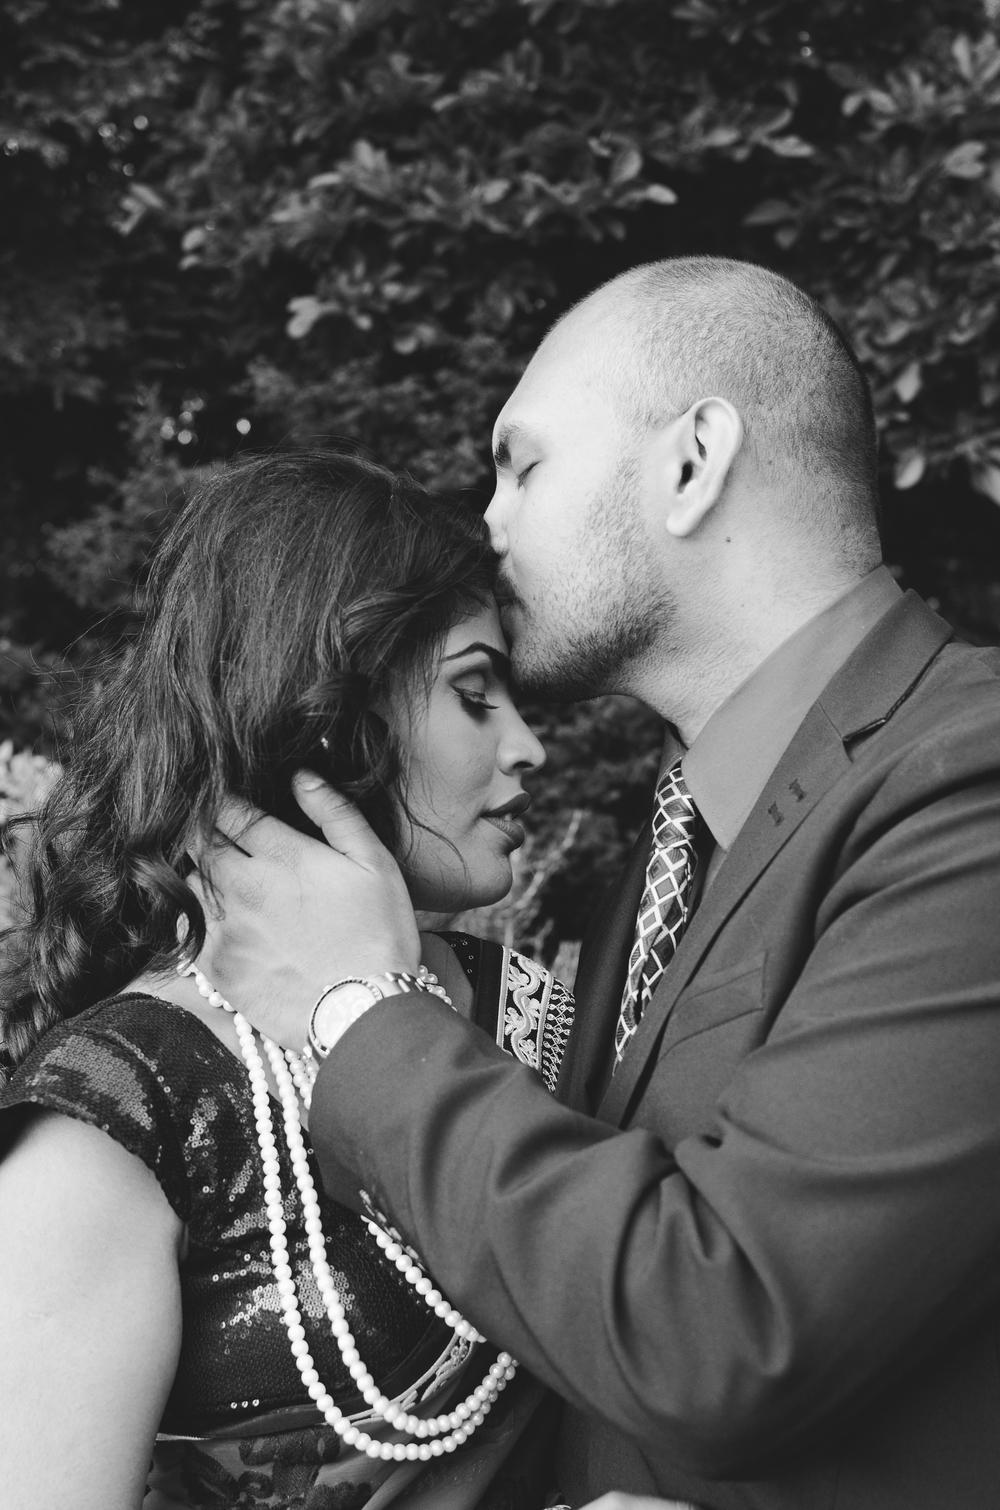 Amresh + Salona Katie Powell Photography Vancouver Engagement Stanley Park Portraits-4.jpg